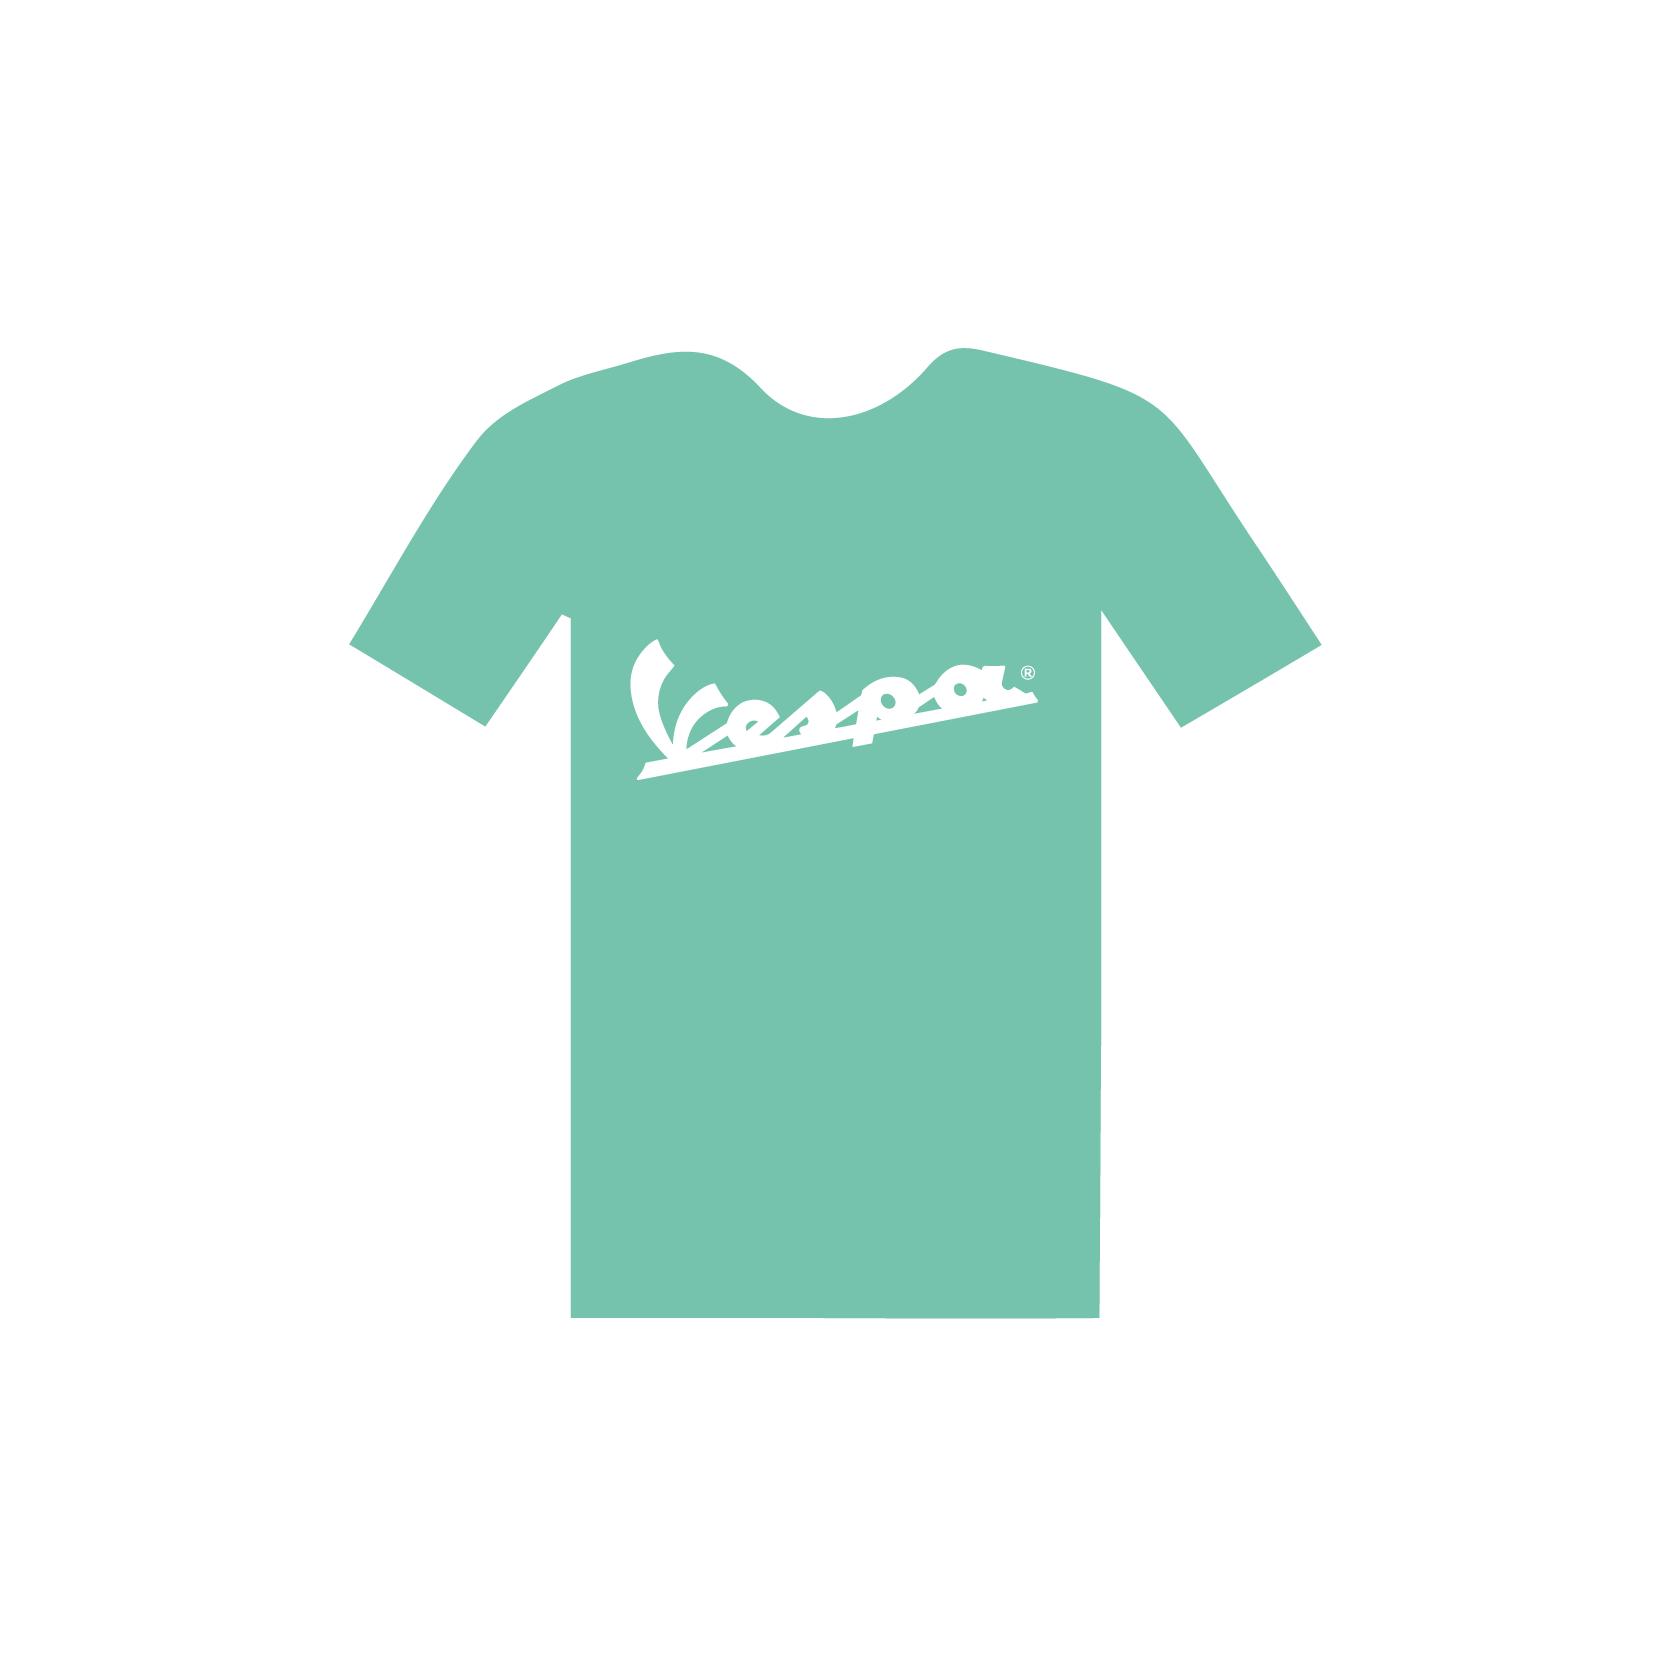 Vespa Lifestyle Bekleidung